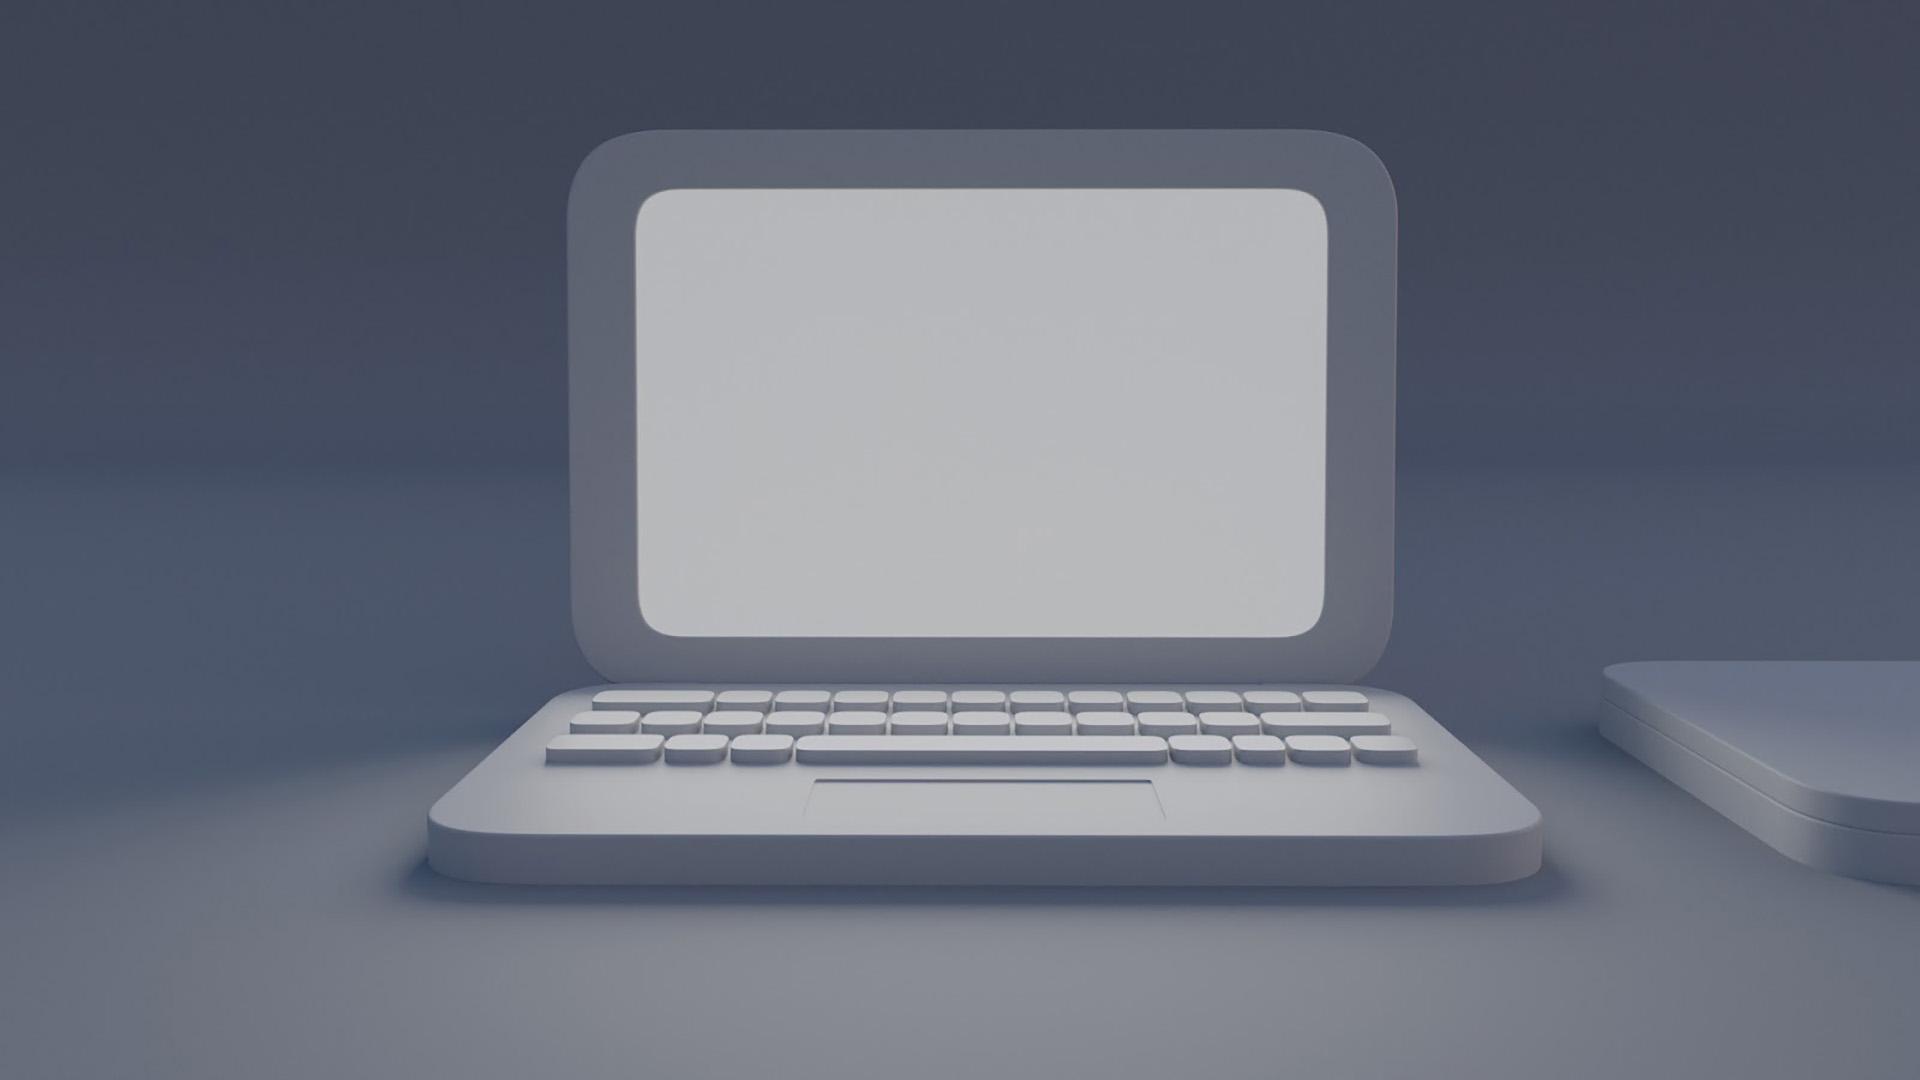 roofstudio_juni-learning_laptop-02-5